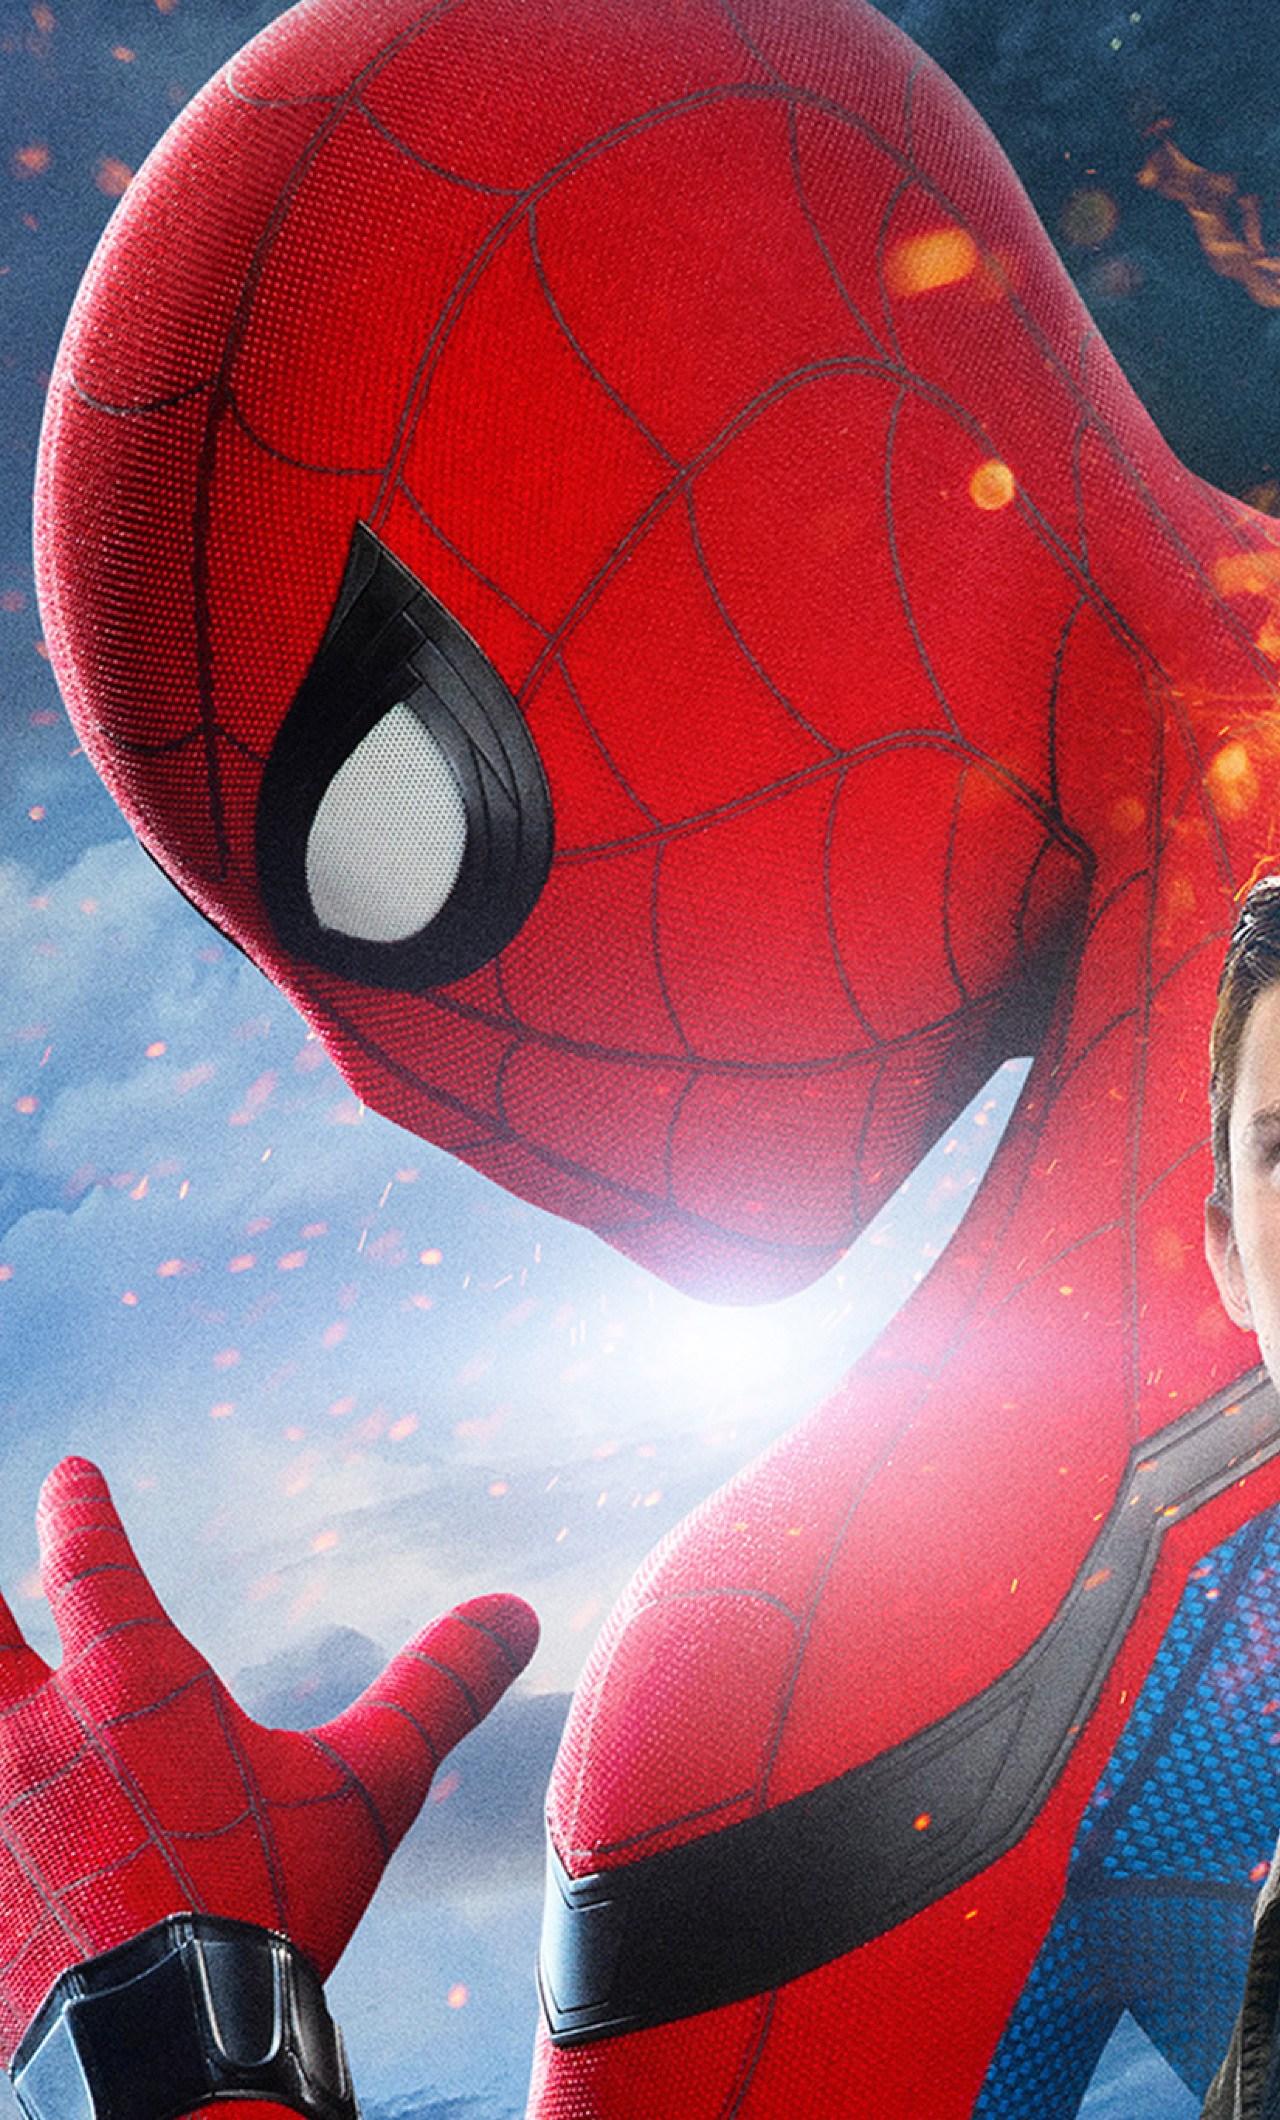 Iphone 6 Plus Source Spider Man Homecoming Wallpaper 4k